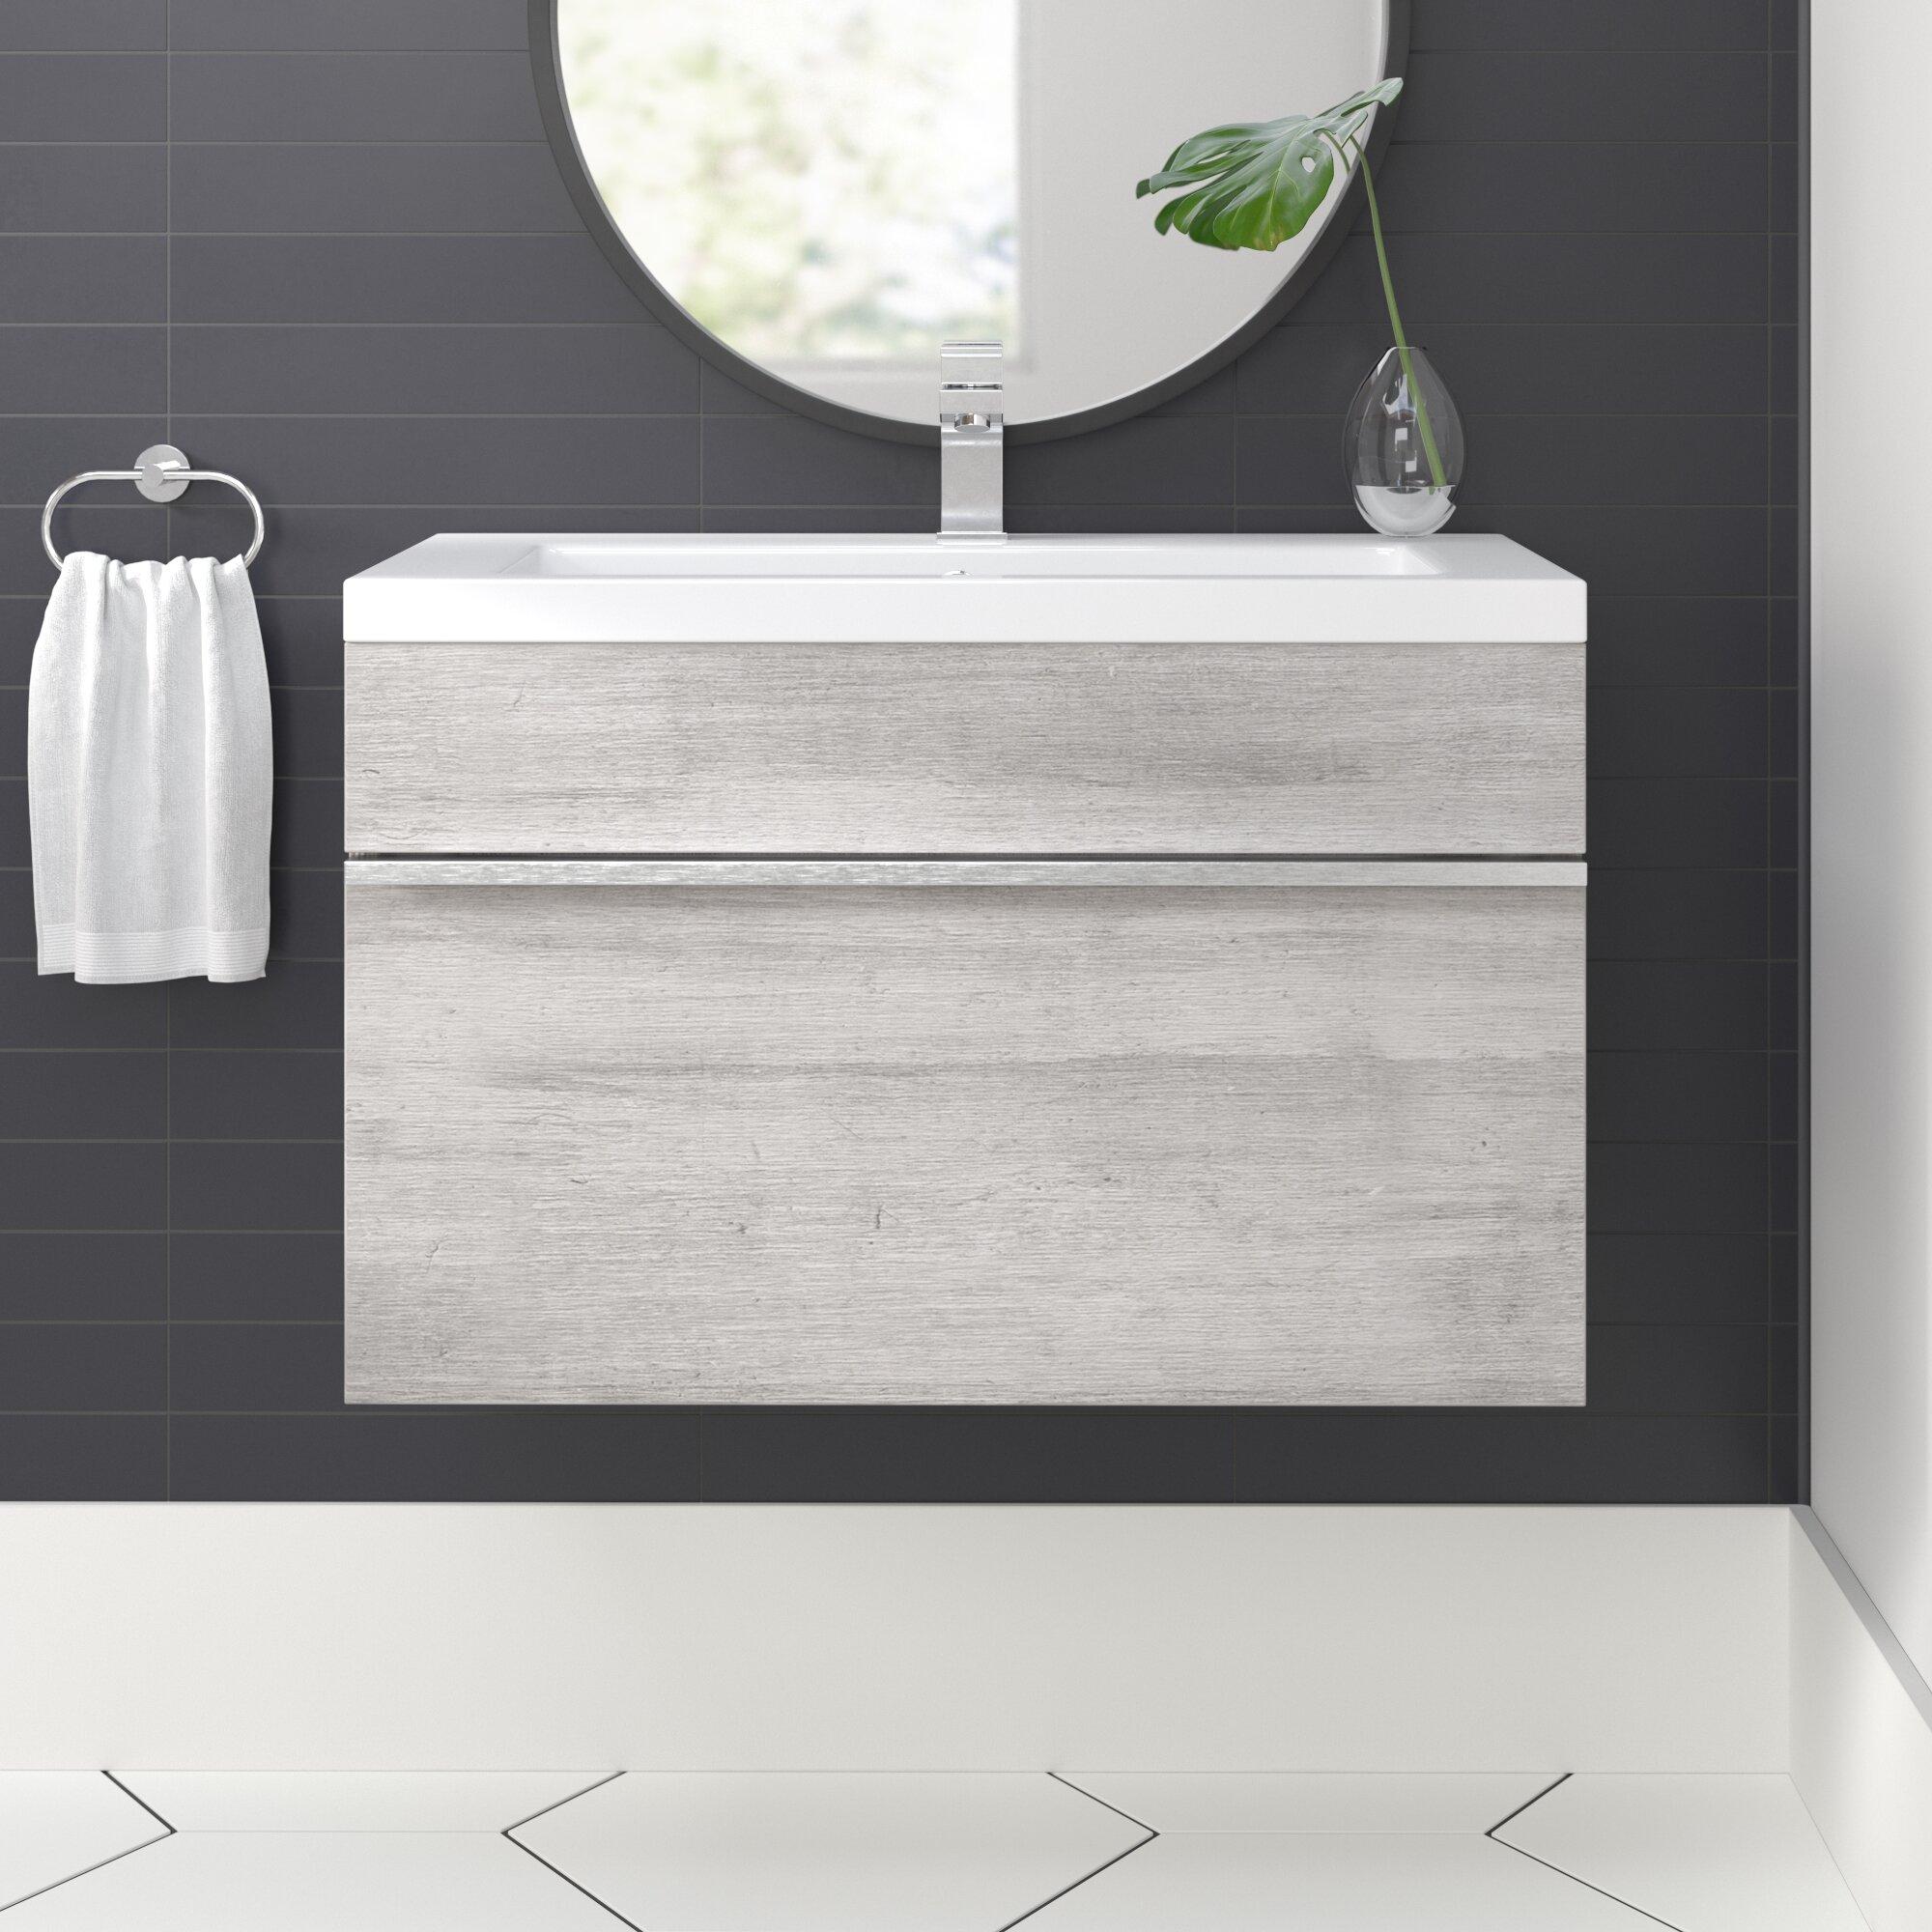 Caitlynn 24 Wall Mounted Single Bathroom Vanity Set Reviews Allmodern